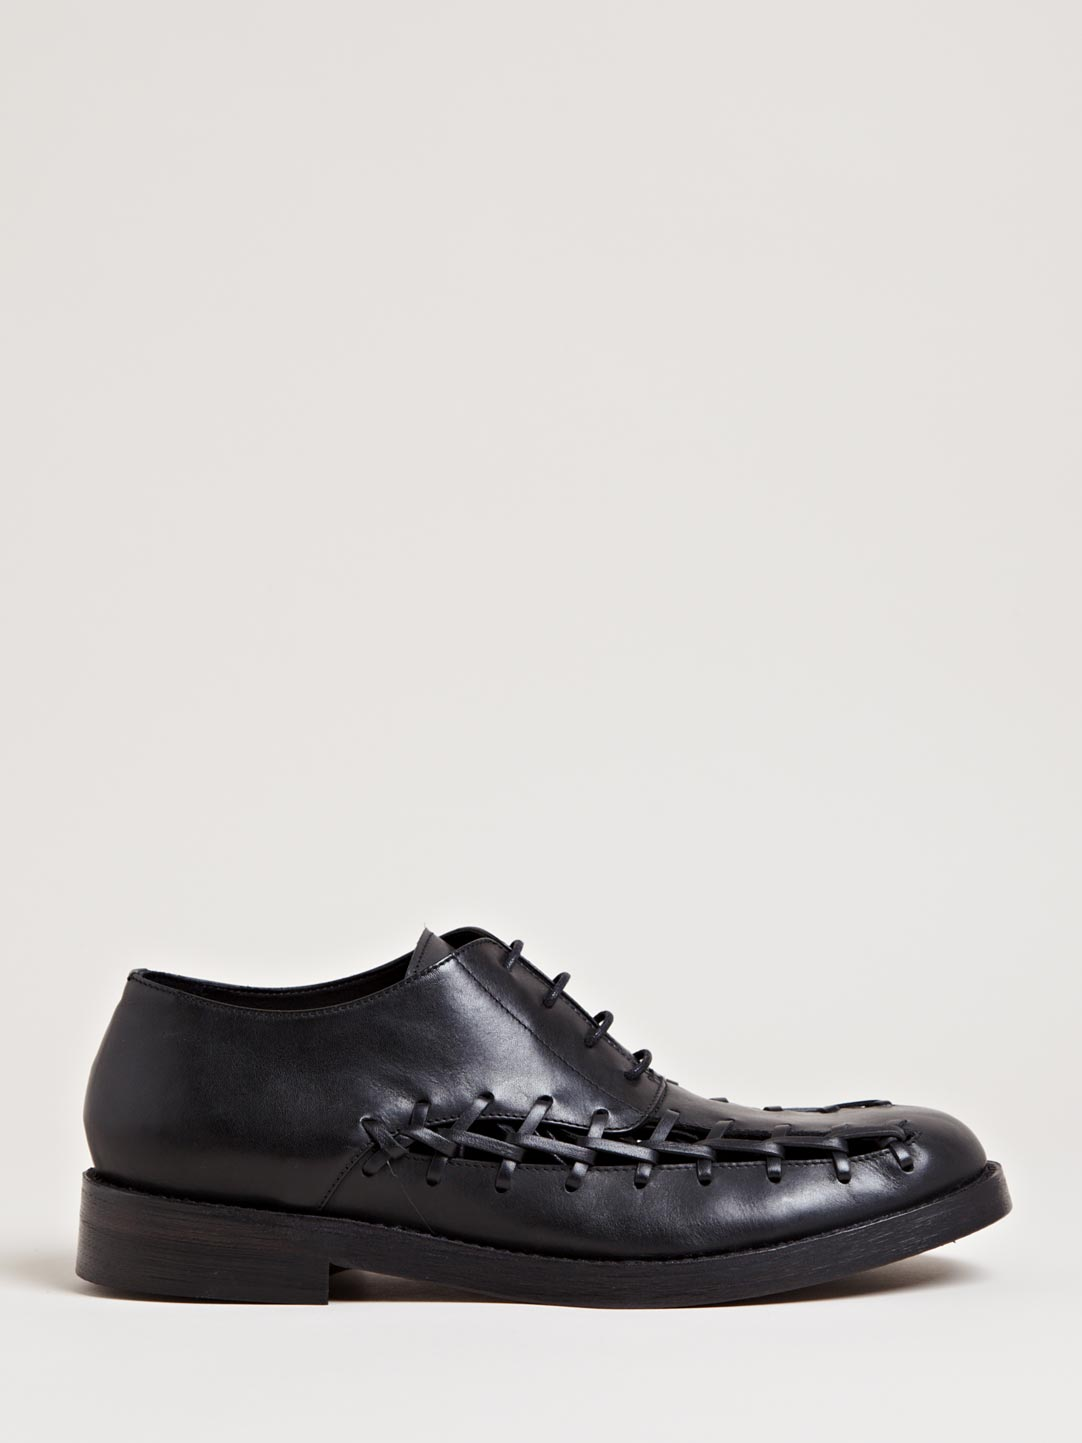 Damir Doma Mens Shoes